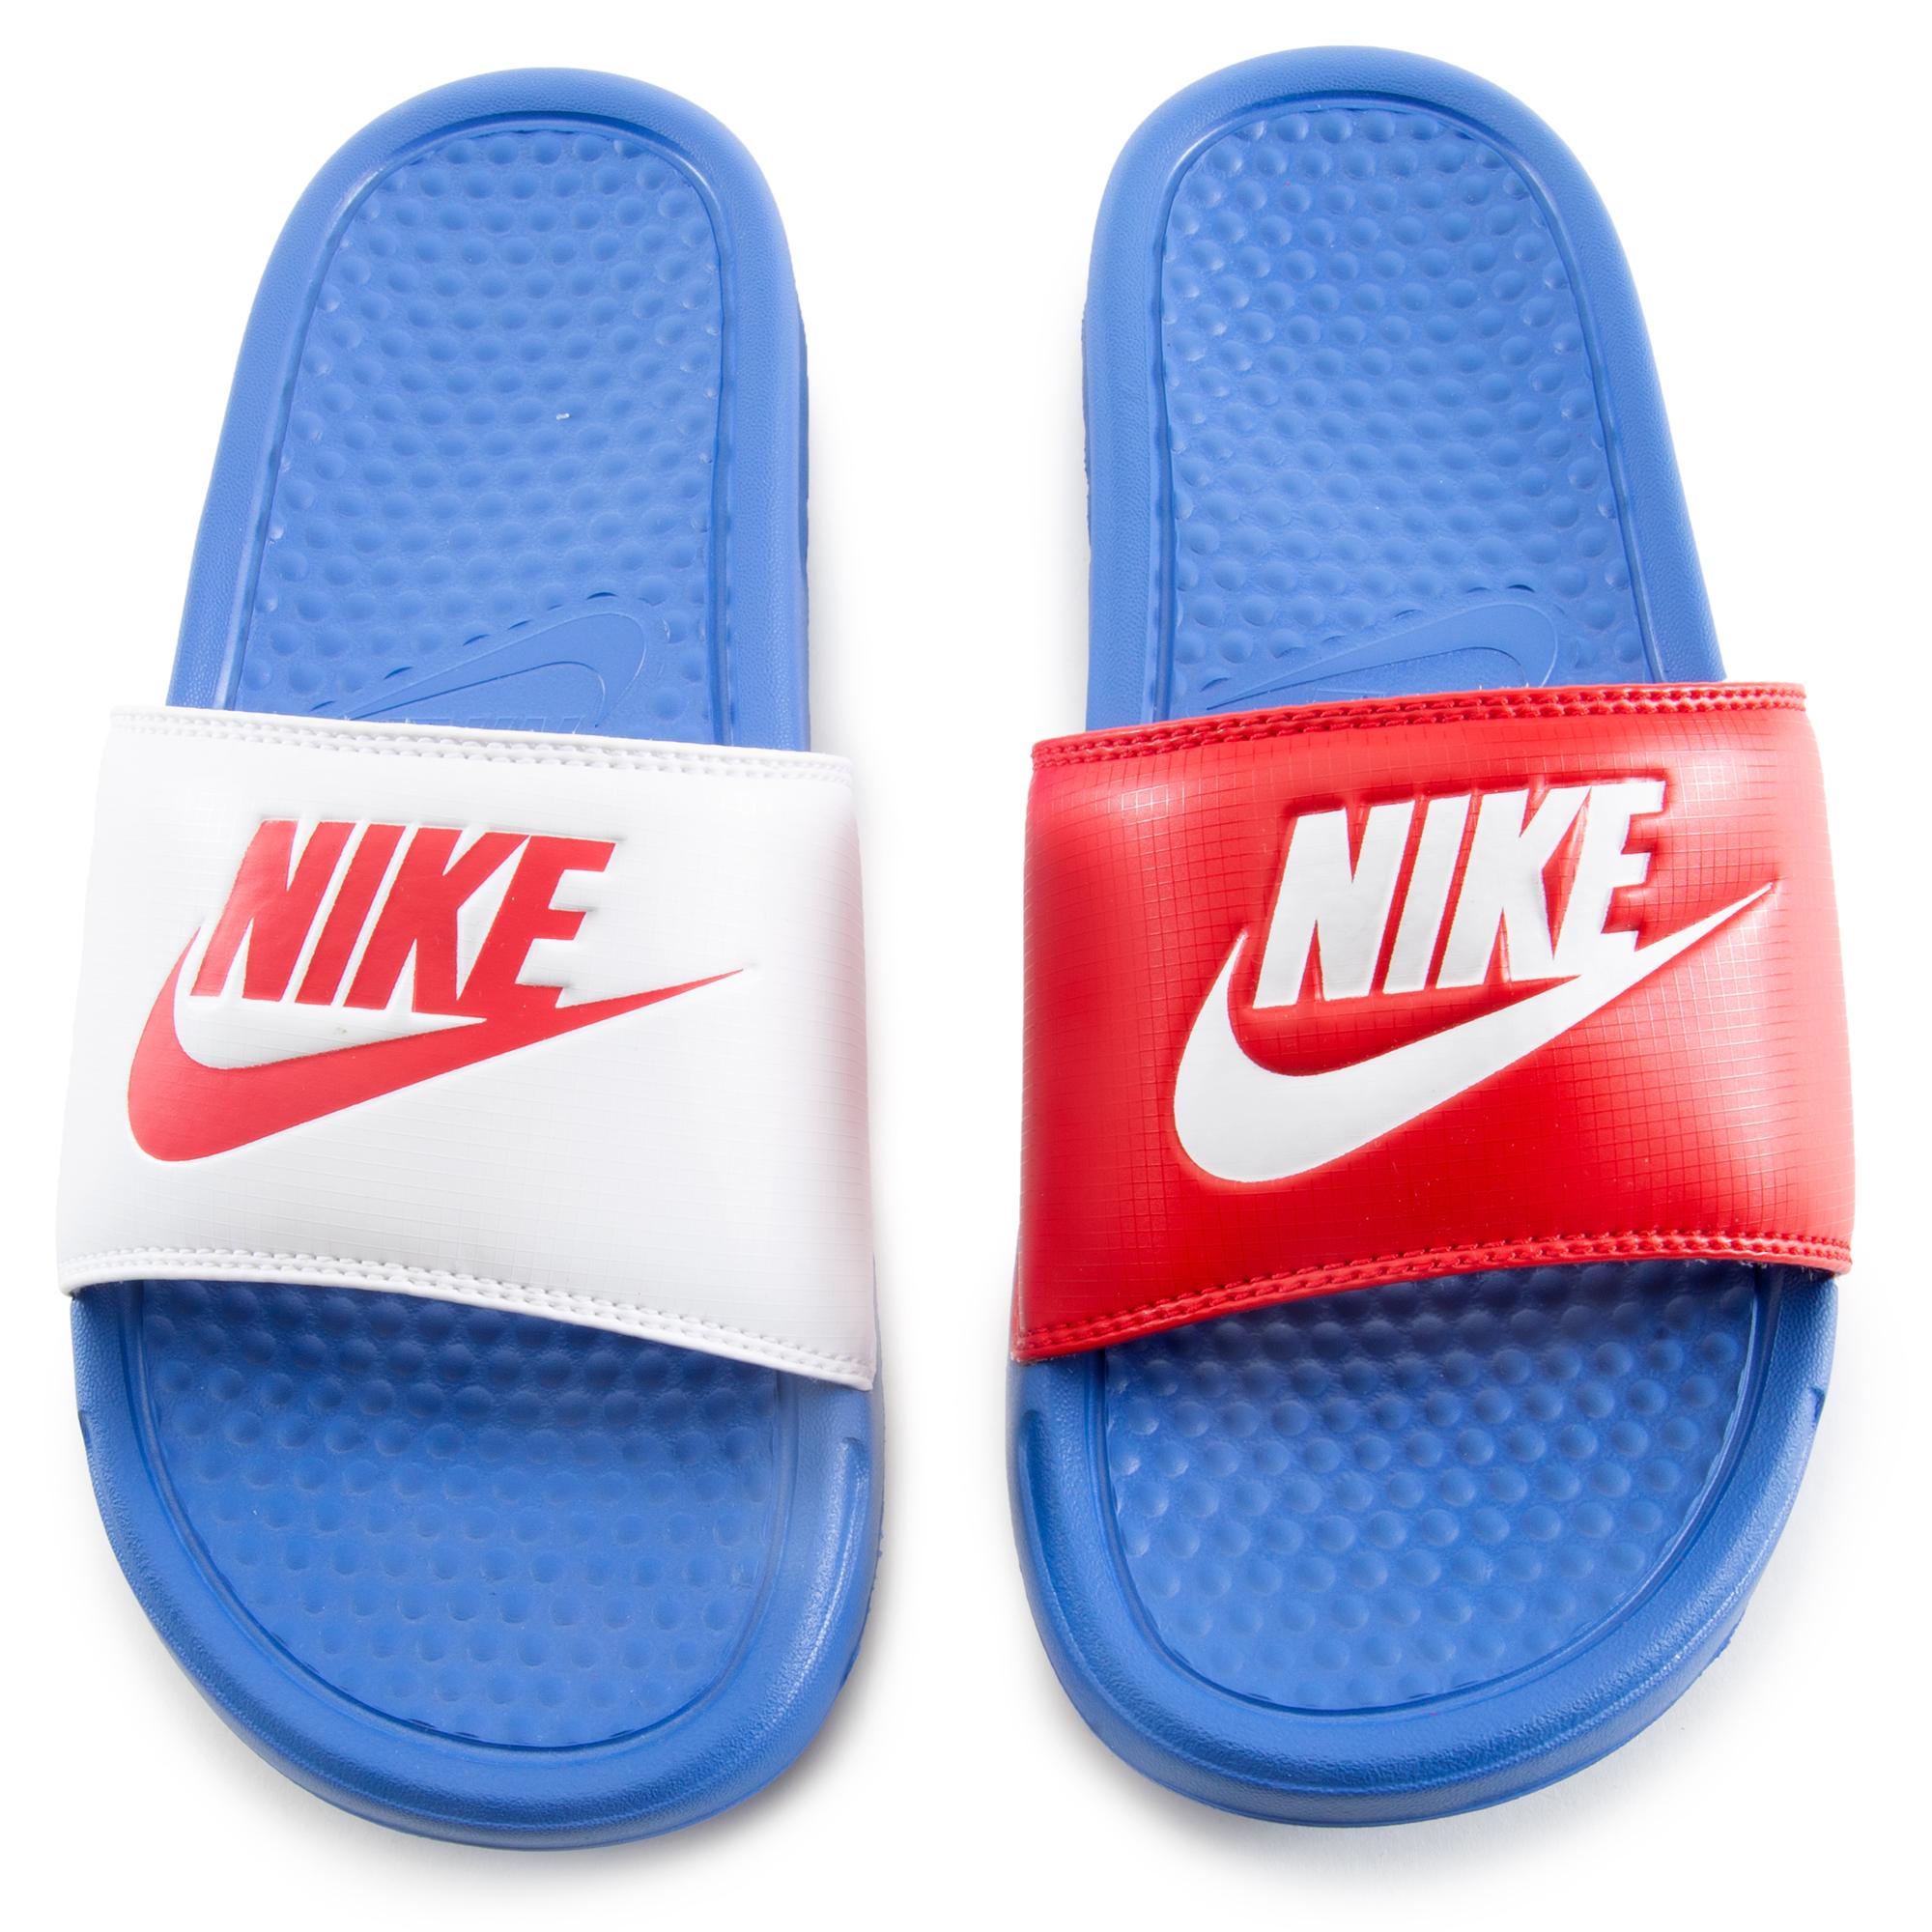 Proponer No lo hagas masculino  Women's Benassi JDI Slides Blue/White/Red